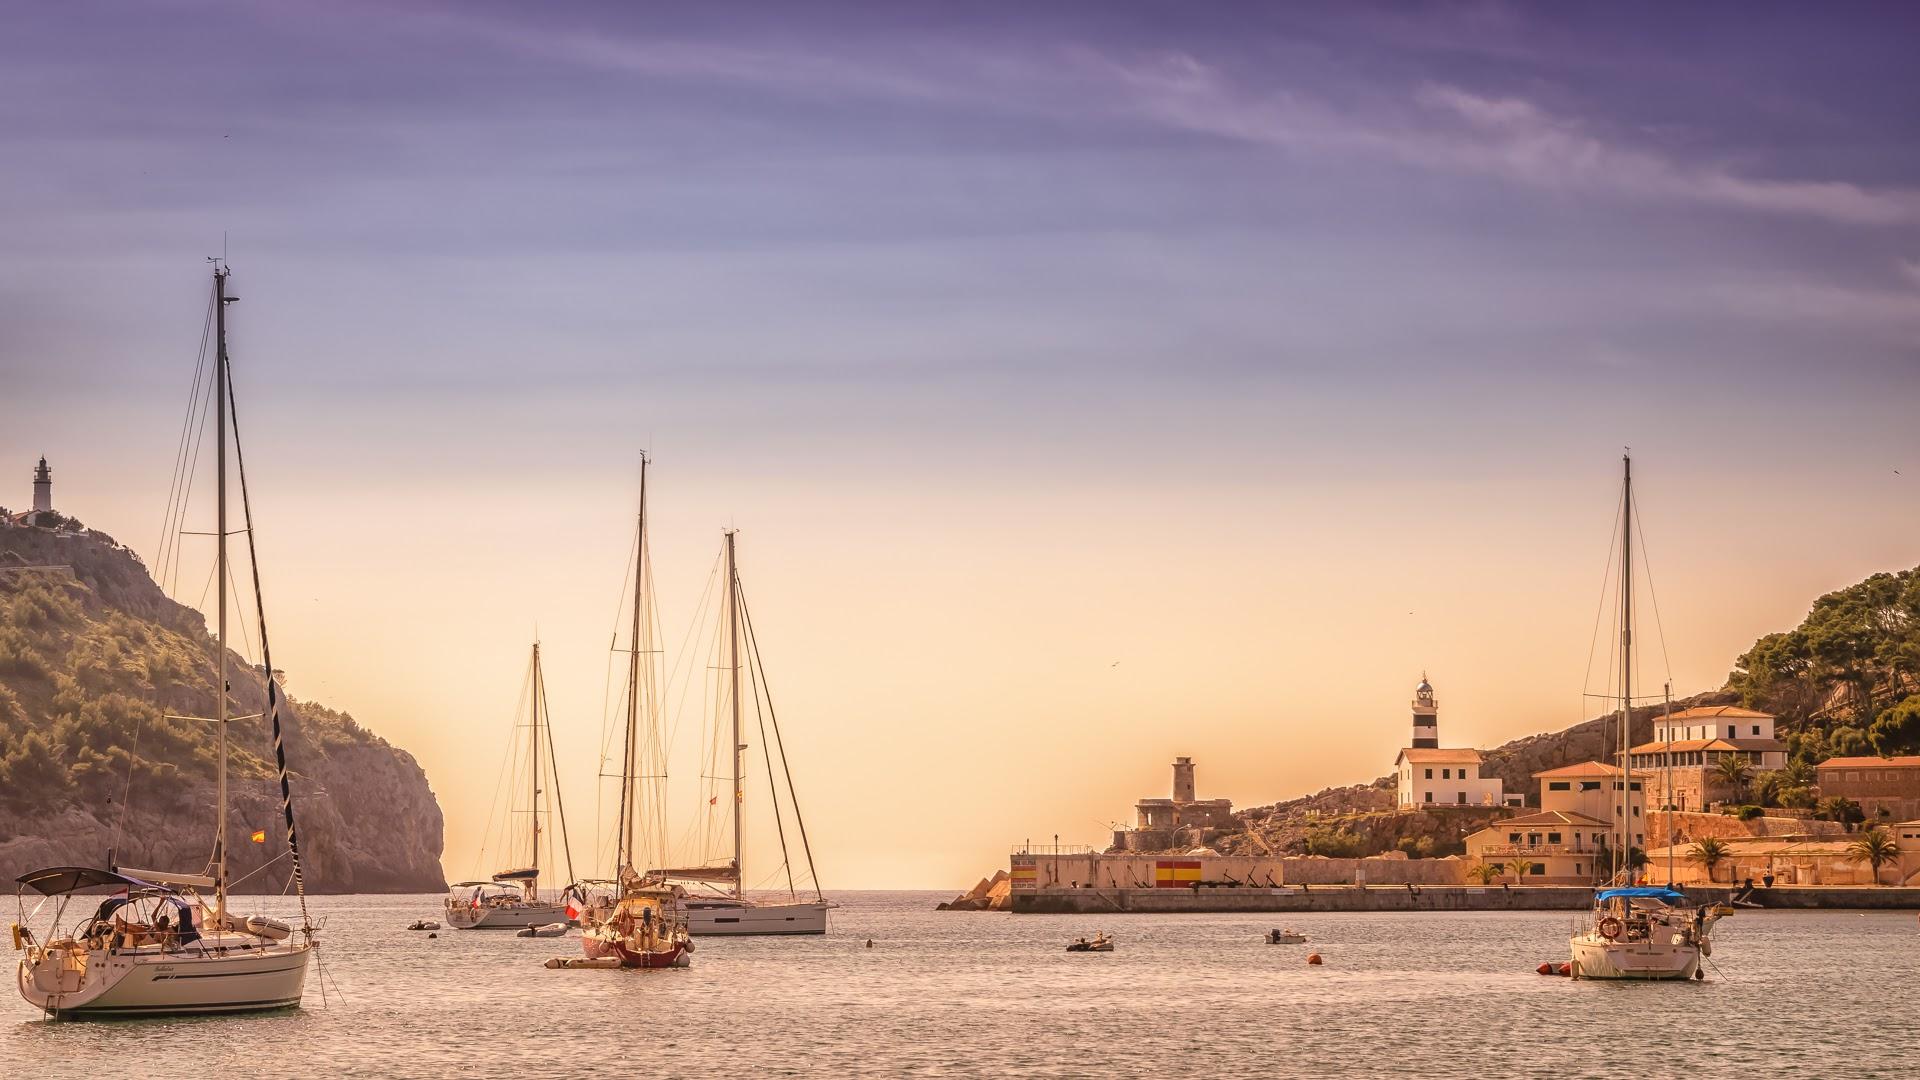 Reisefoto: Port de Sóller